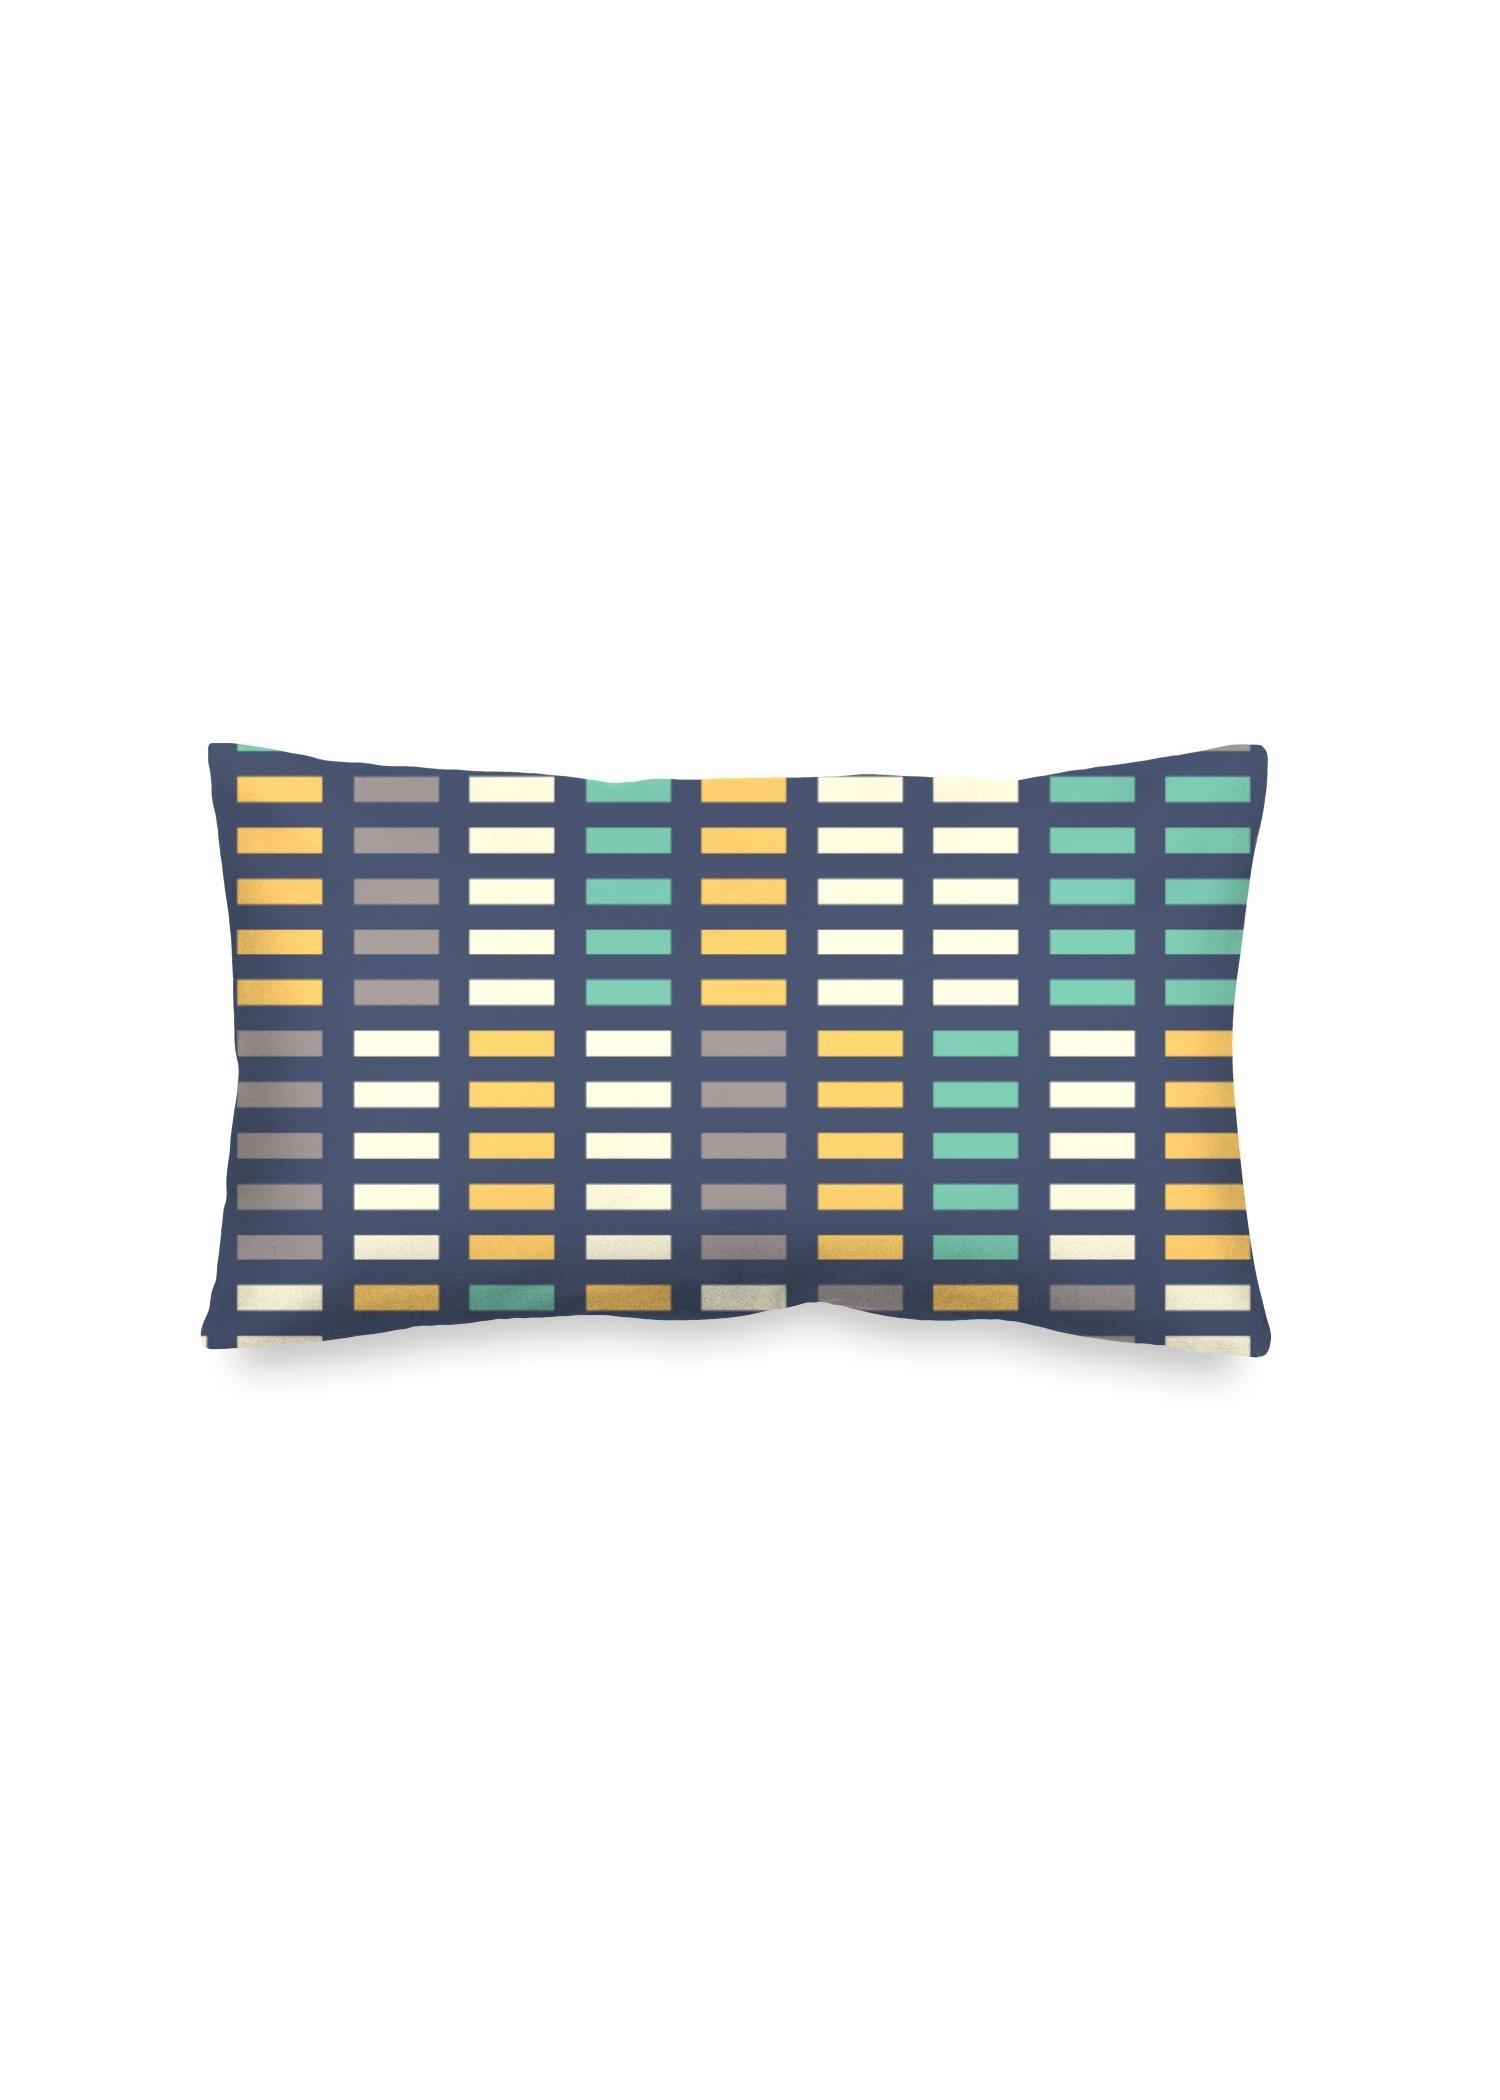 VIDA Oblong Pillow - Music Equalizer by VIDA Original Artist  - Size: Luster